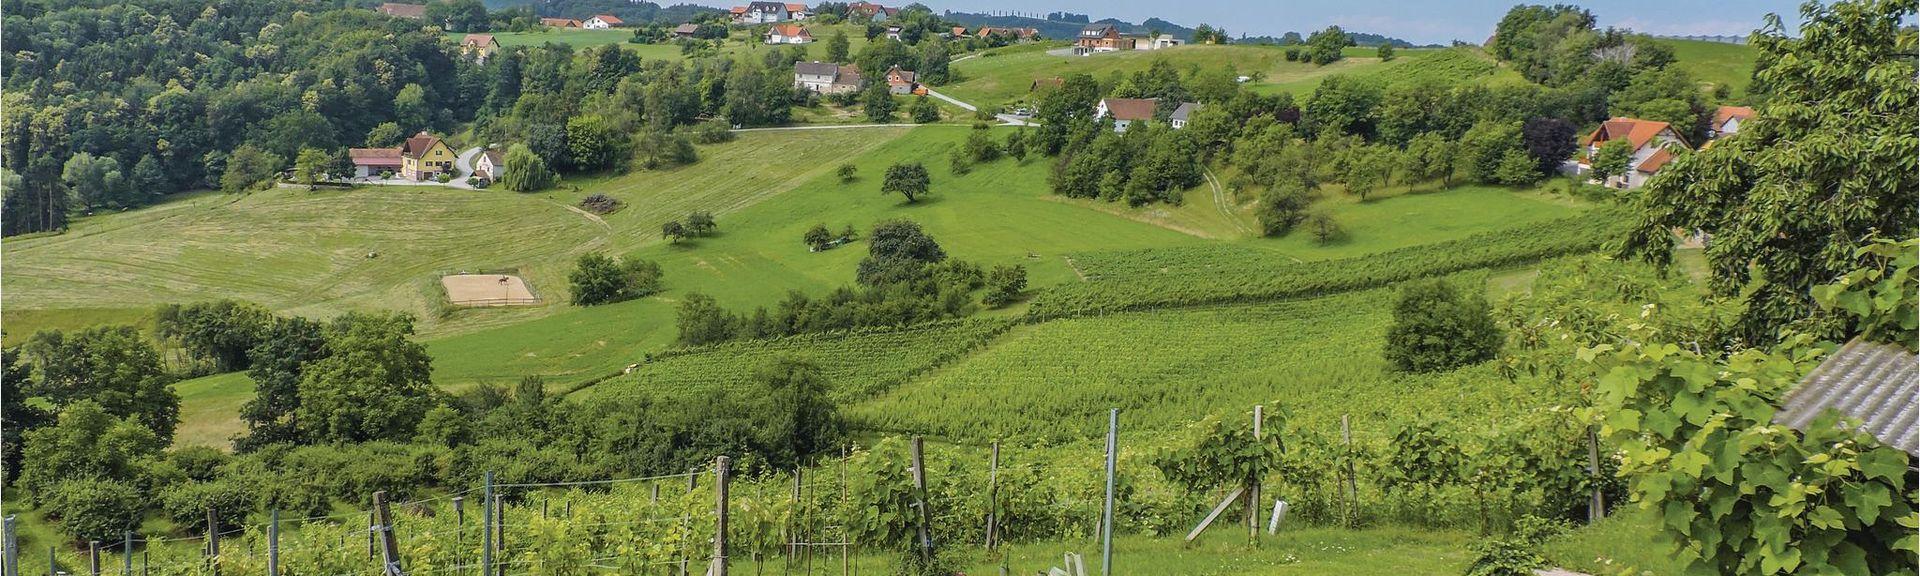 Lodersdorf, Styria, Austria